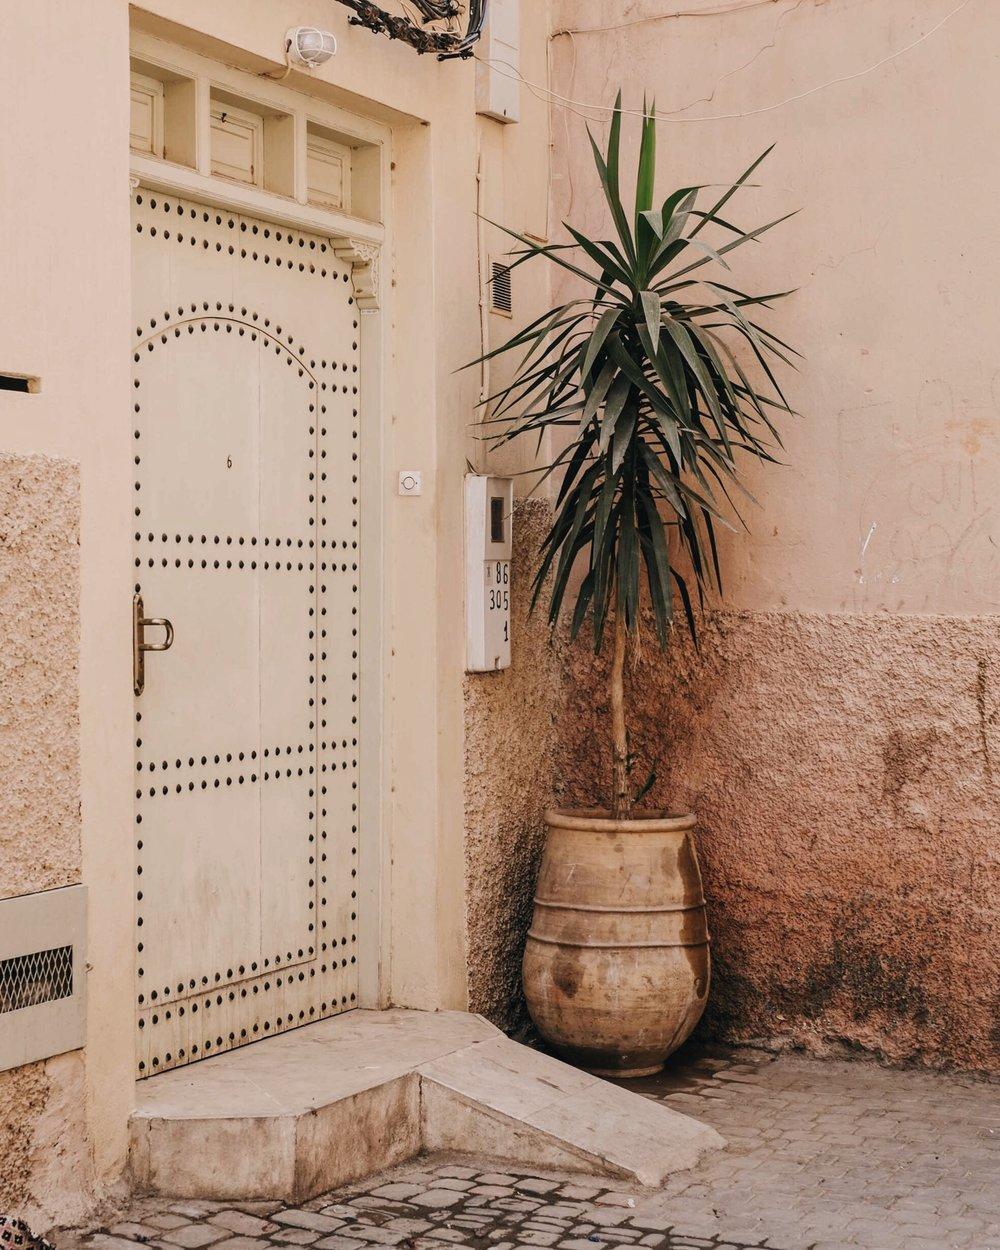 CAMILA_GUTIERREZ_MOROCCO_HOTEL_WEEKEND7.JPG